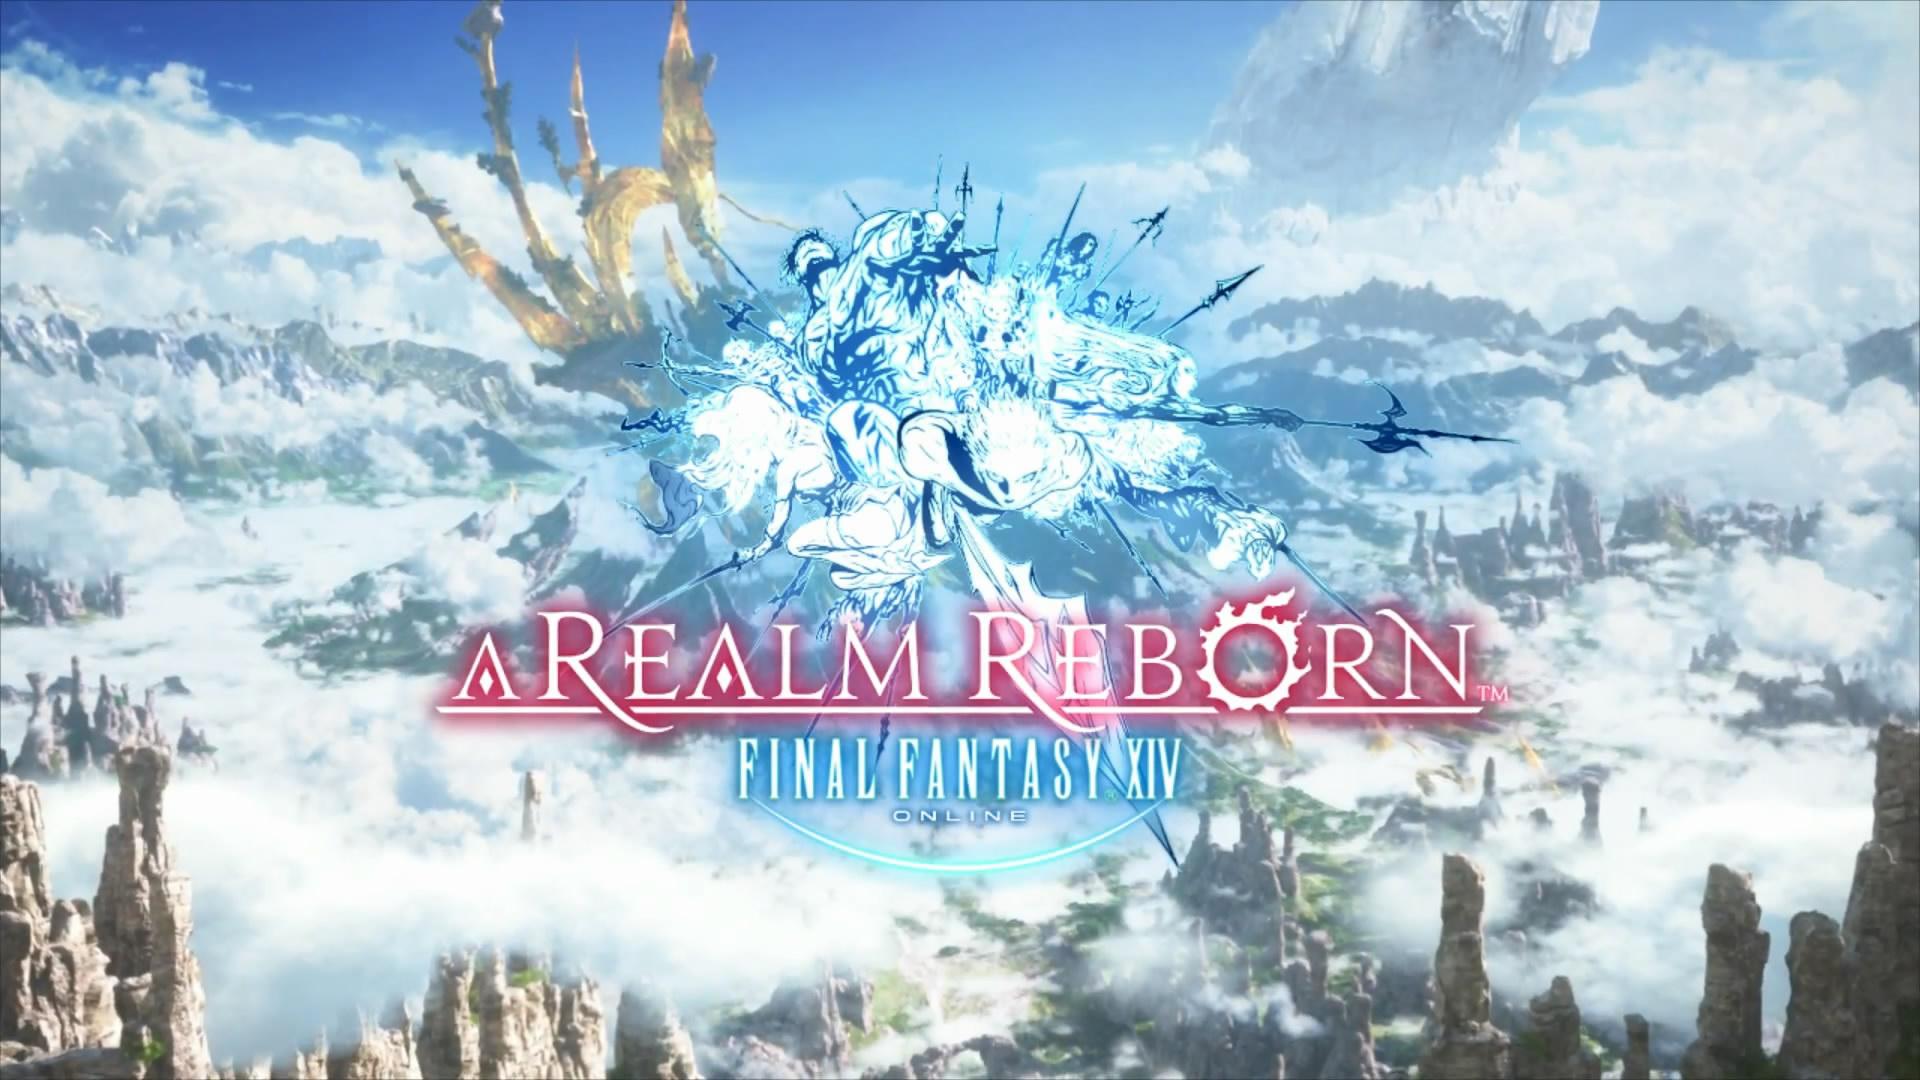 Final-Fantasy-XIV-A-Realm-Reborn-Wallpaper